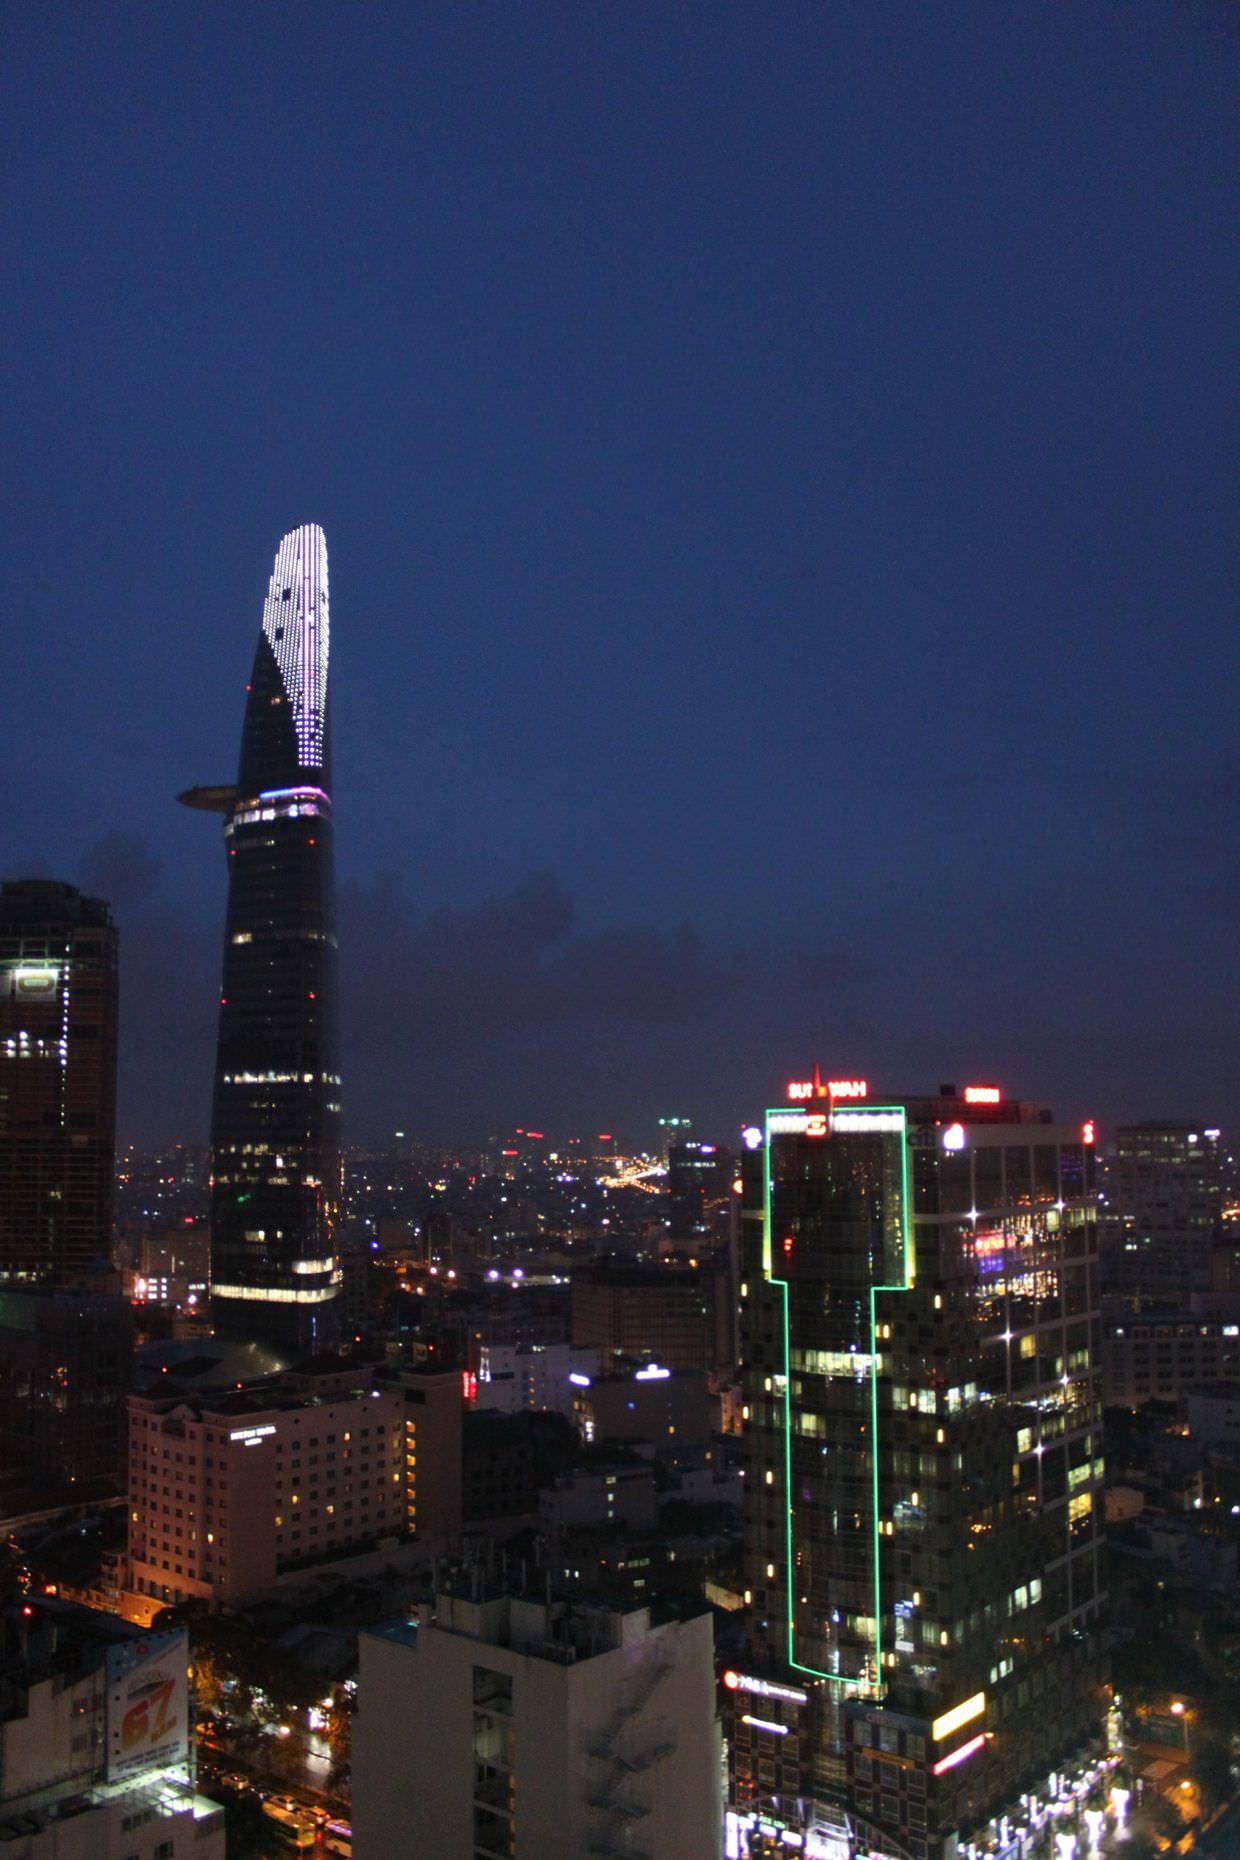 Goodnight Saigon, Goodnight Vietnam